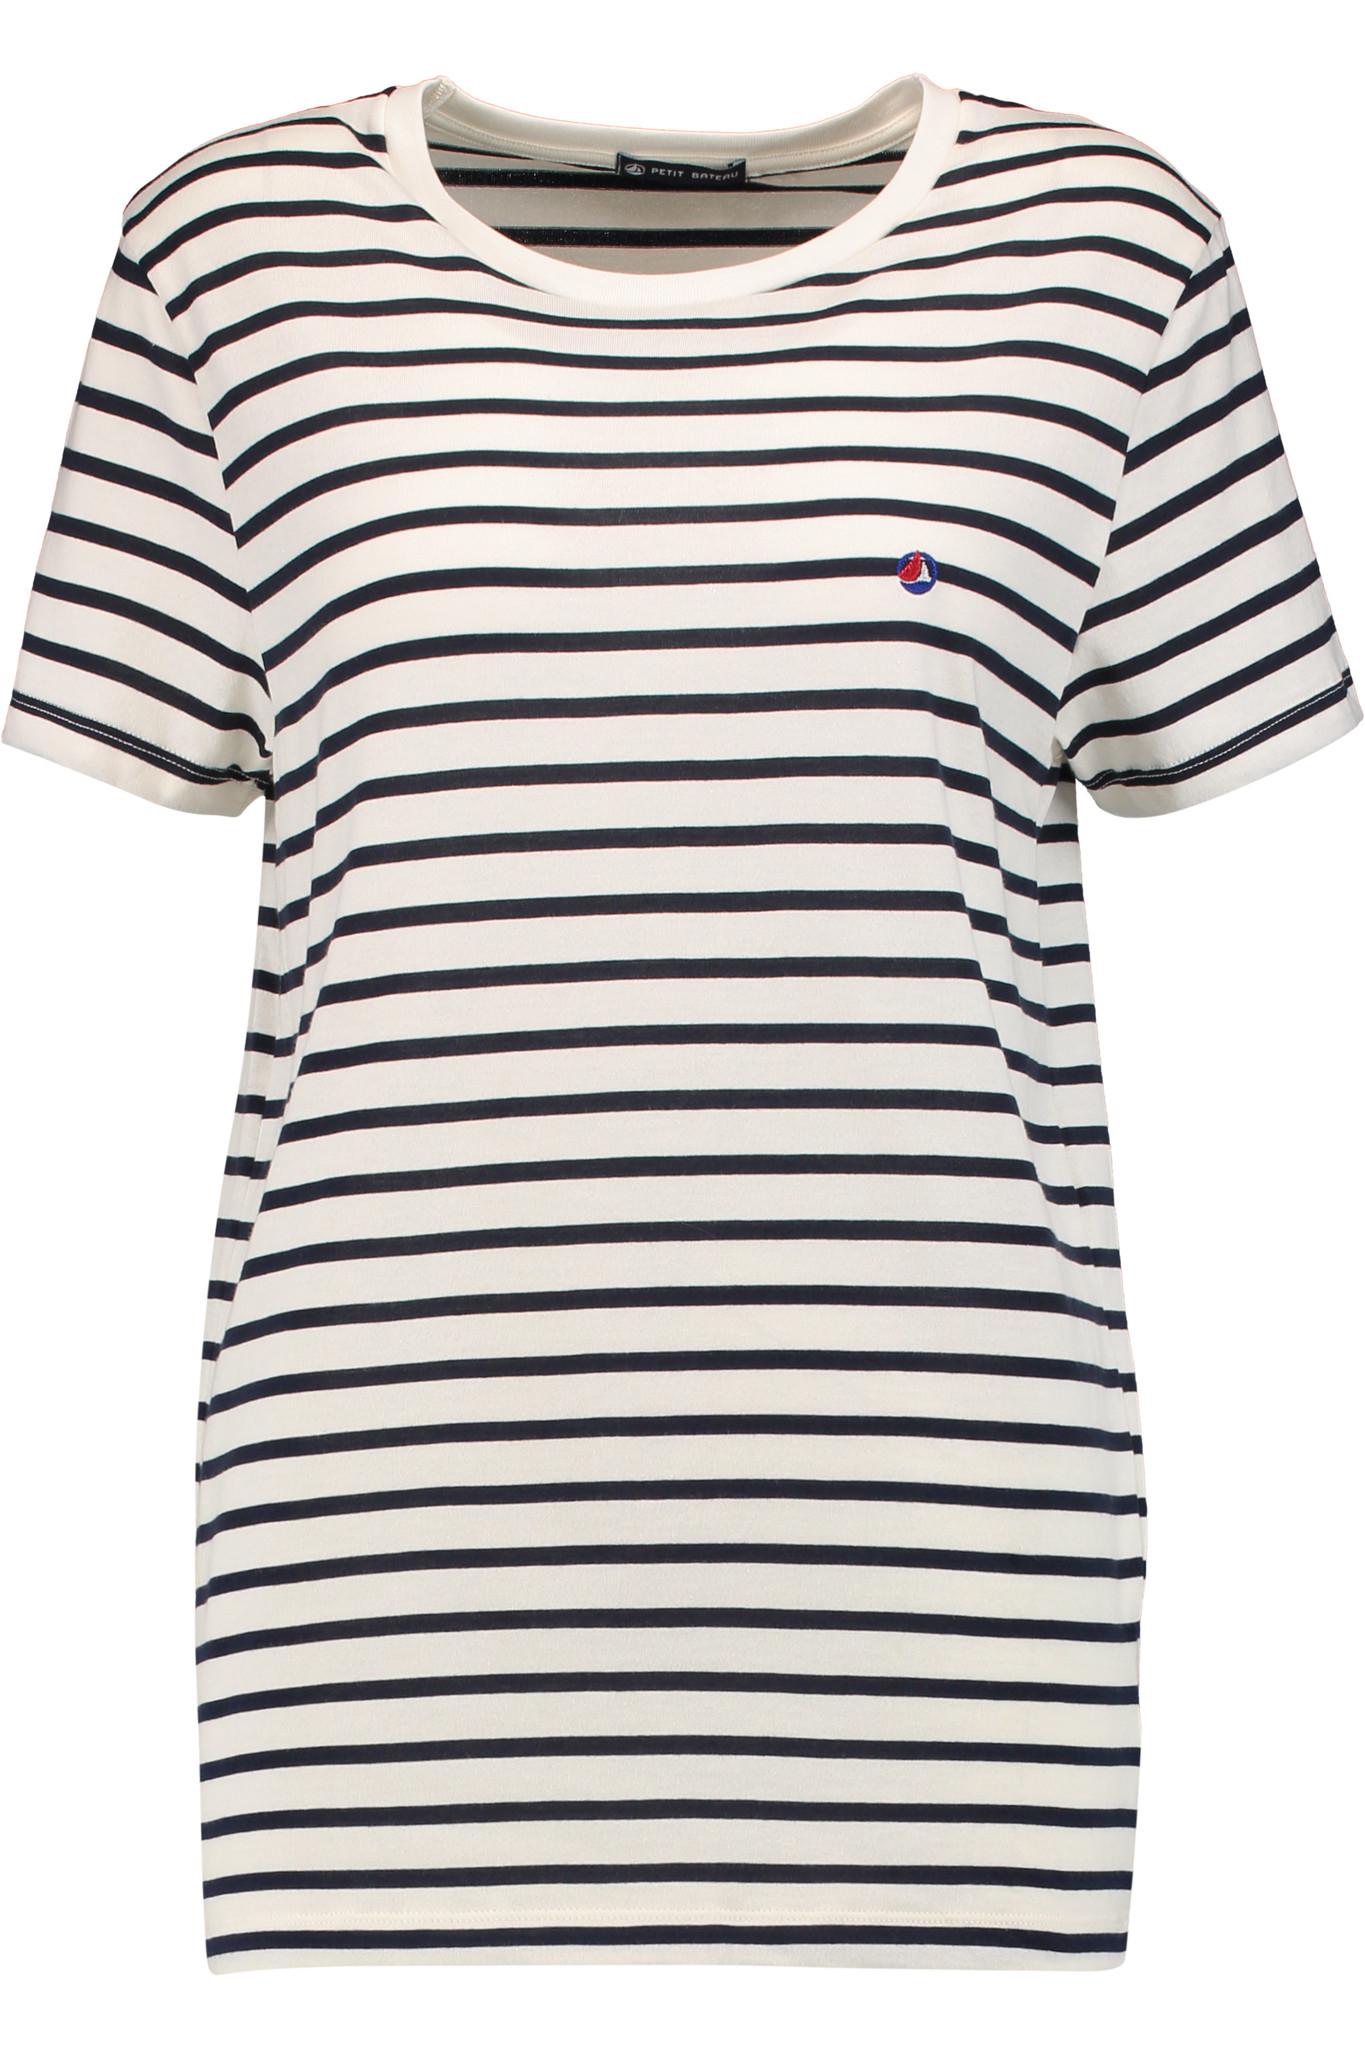 Lyst petit bateau striped cotton top in white for Petit bateau striped shirt